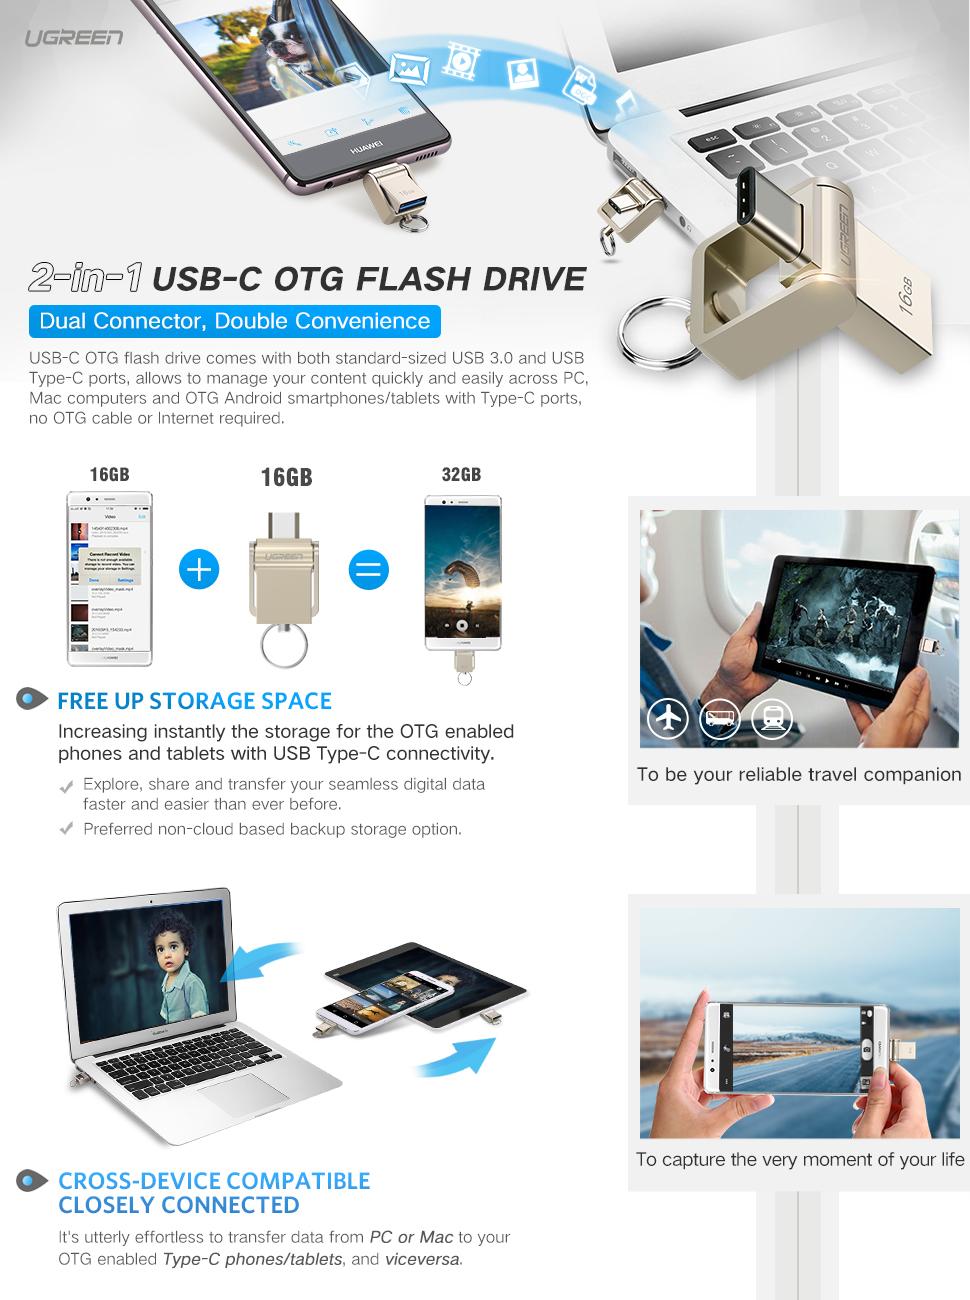 Ugreen Type C Memory Stick 16g 2 In 1 Usb And A Sandisk Ultra Dual Drive Otg Flashdisk 32 Gb 30 Flash 31 Data Storage